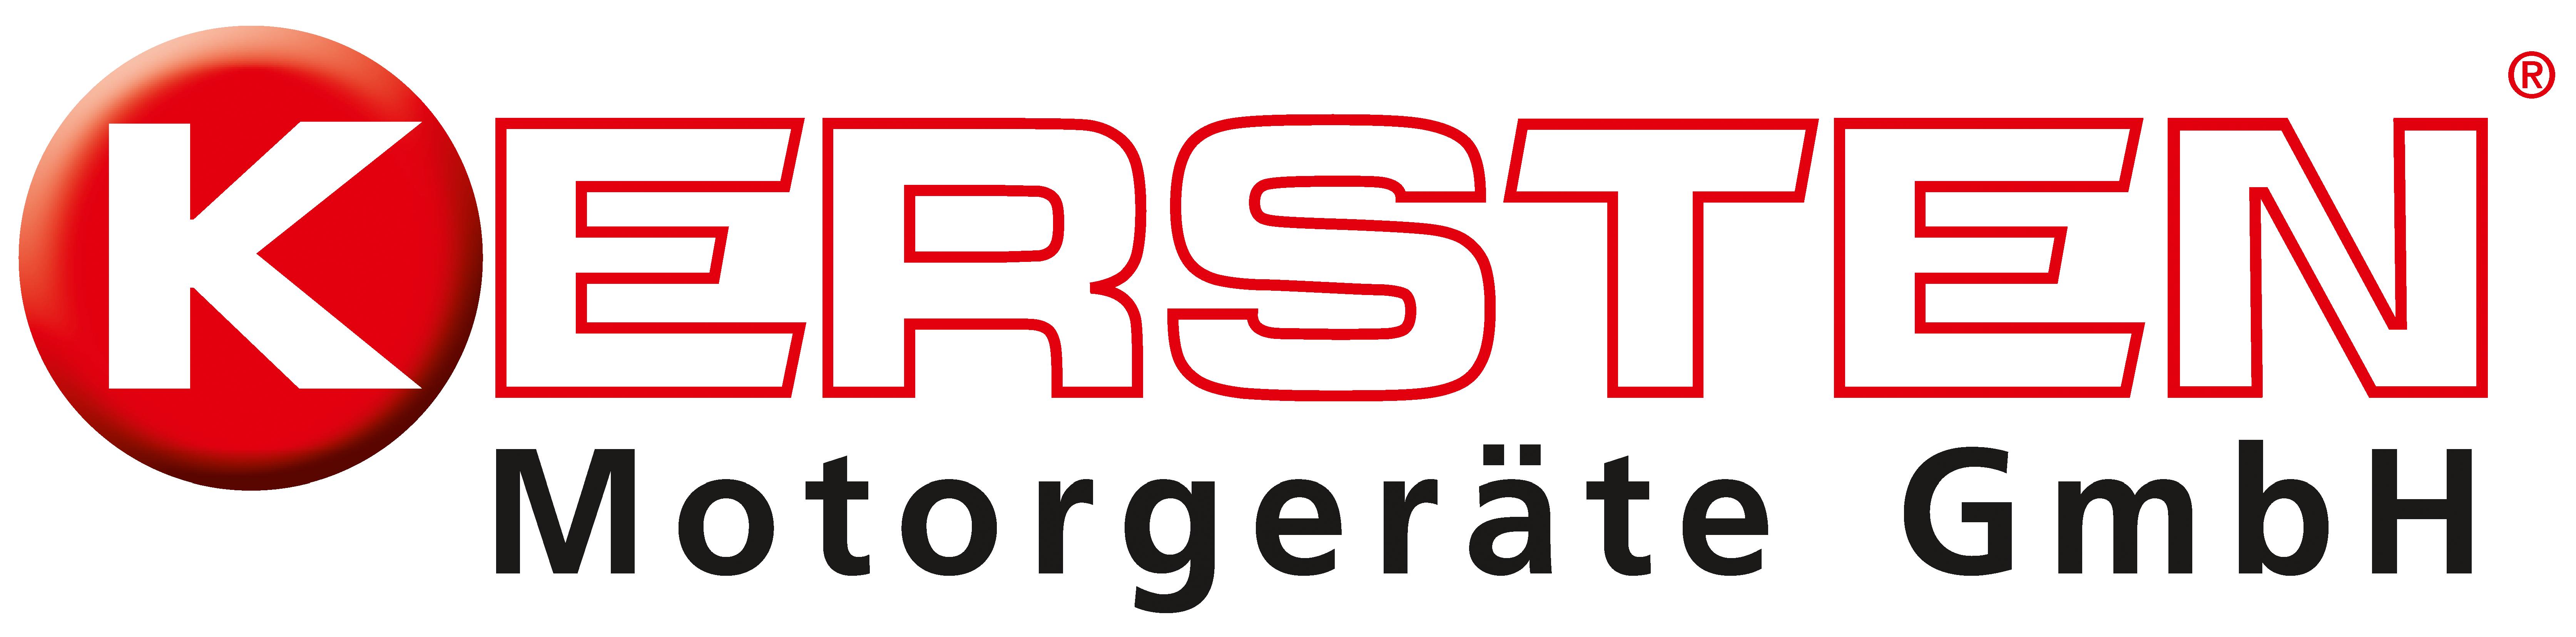 Kersten Motorgeräte GmbH